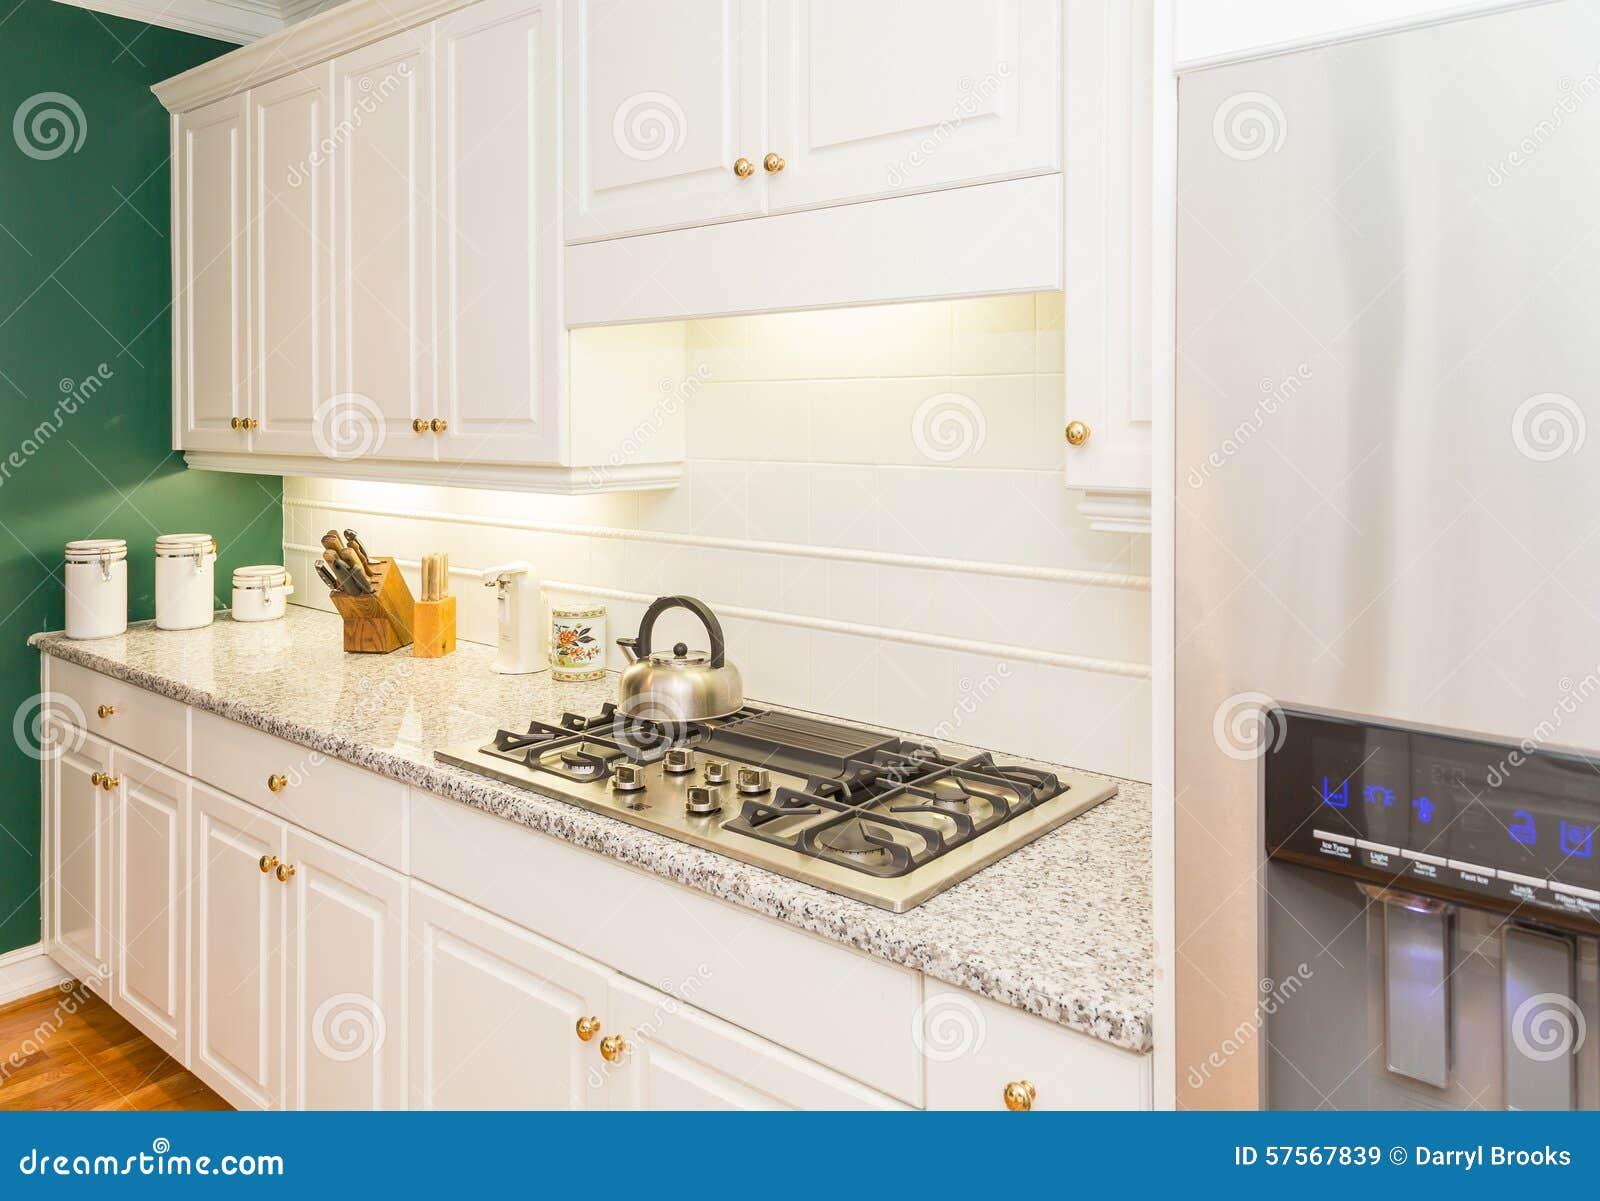 Modern New Kitchen With Granite Countertops Stock Photo